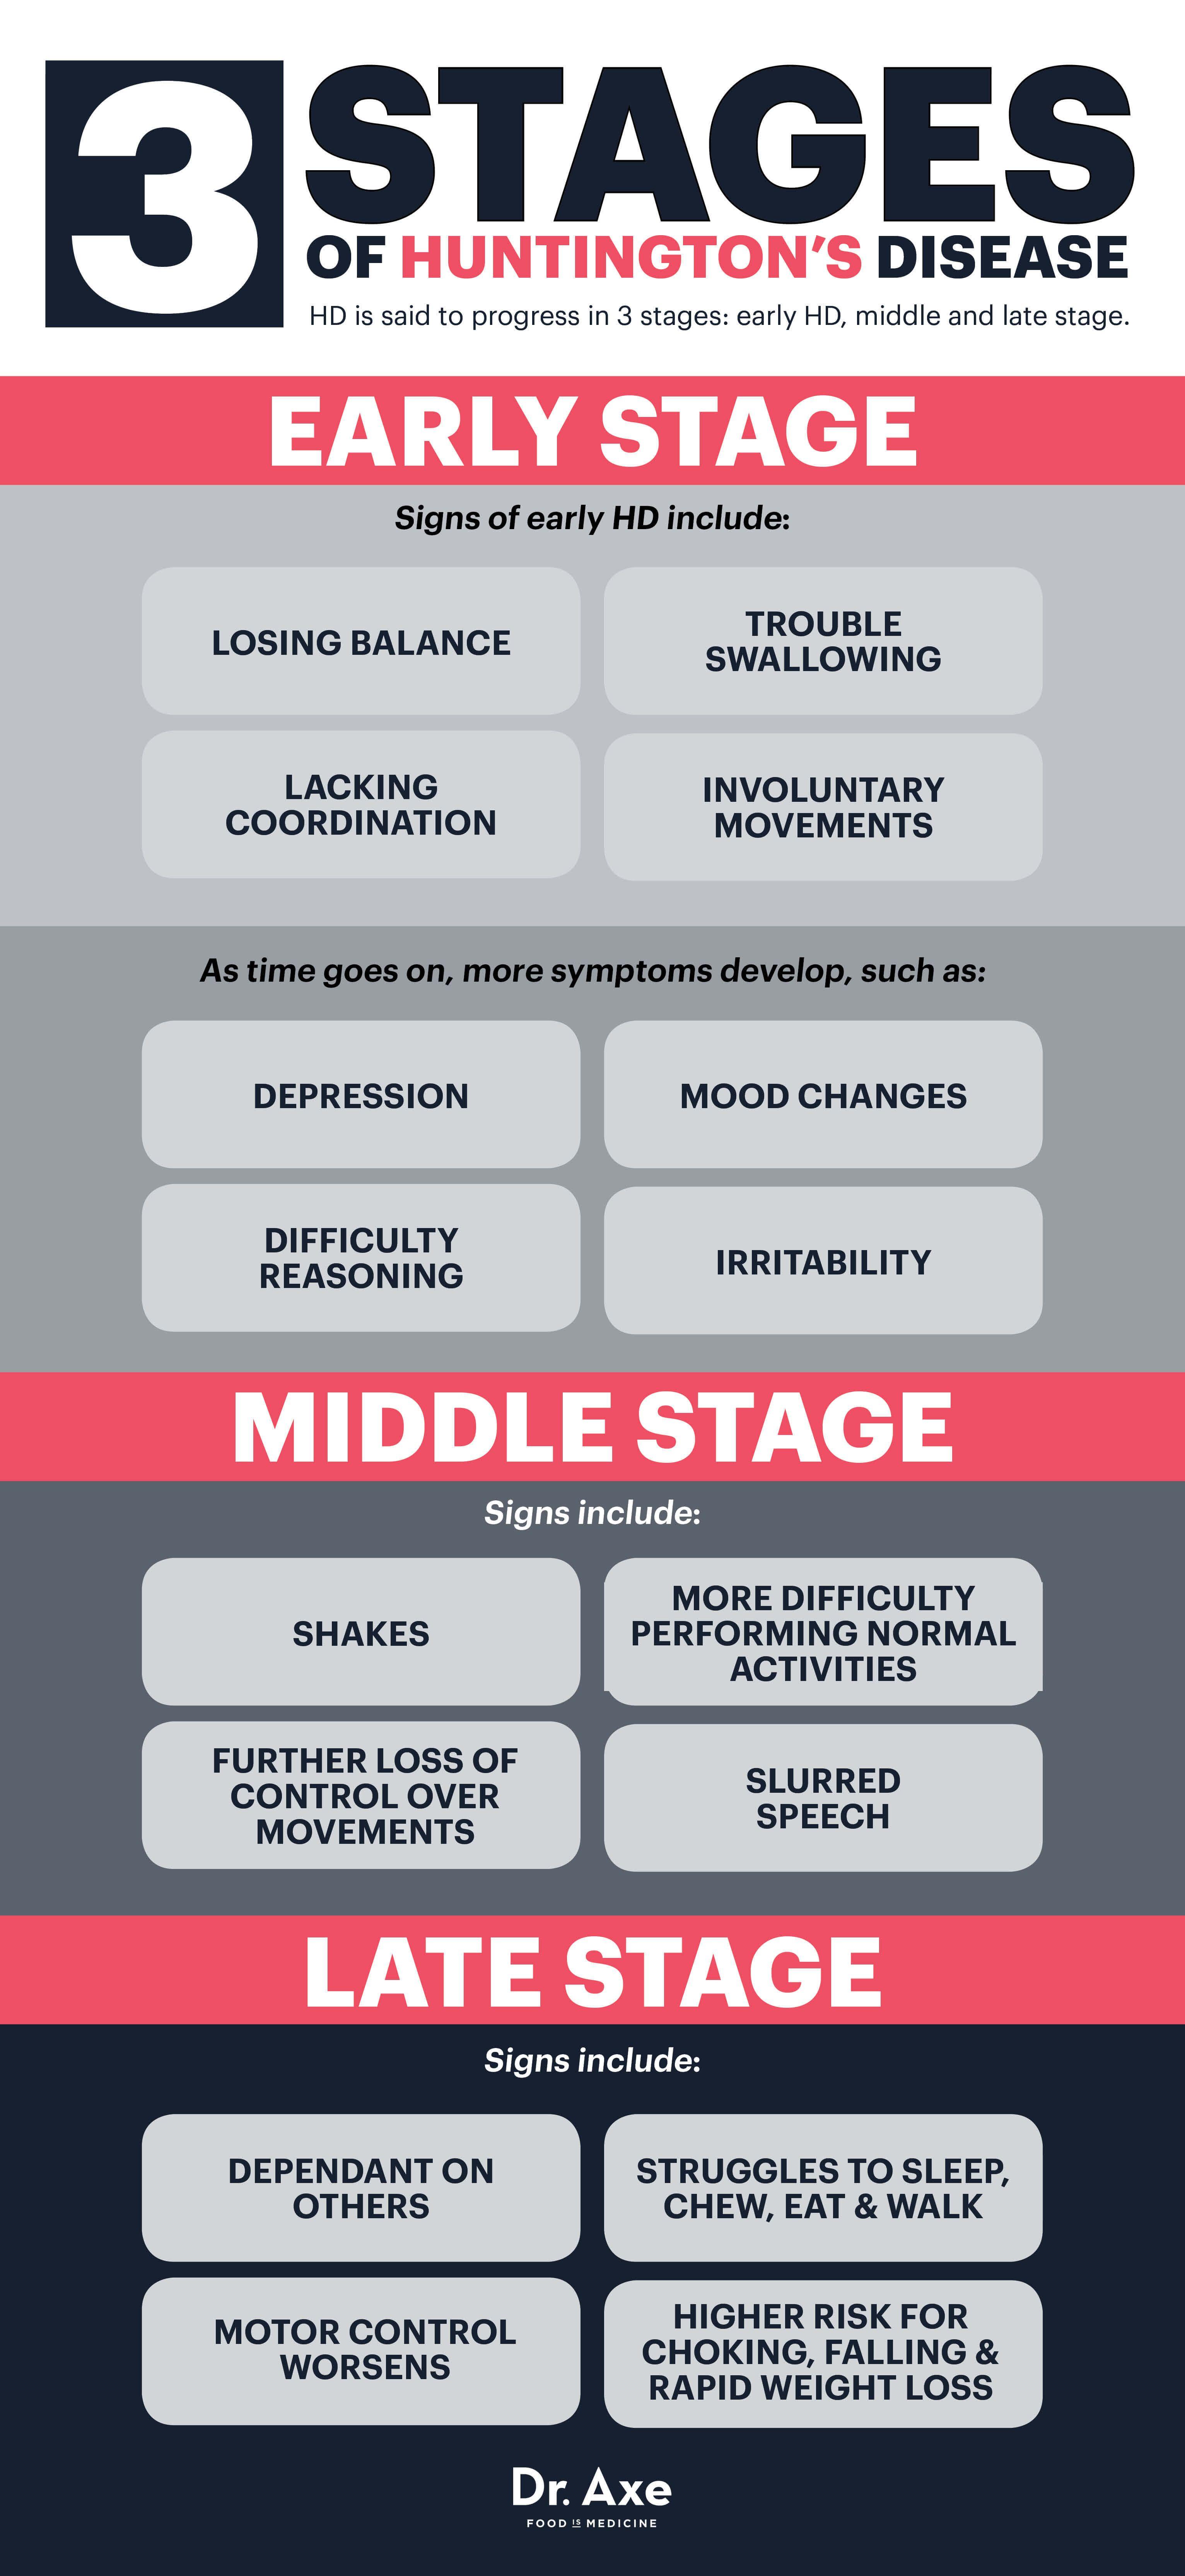 Vitamin k weight loss in menopausal women photo 25